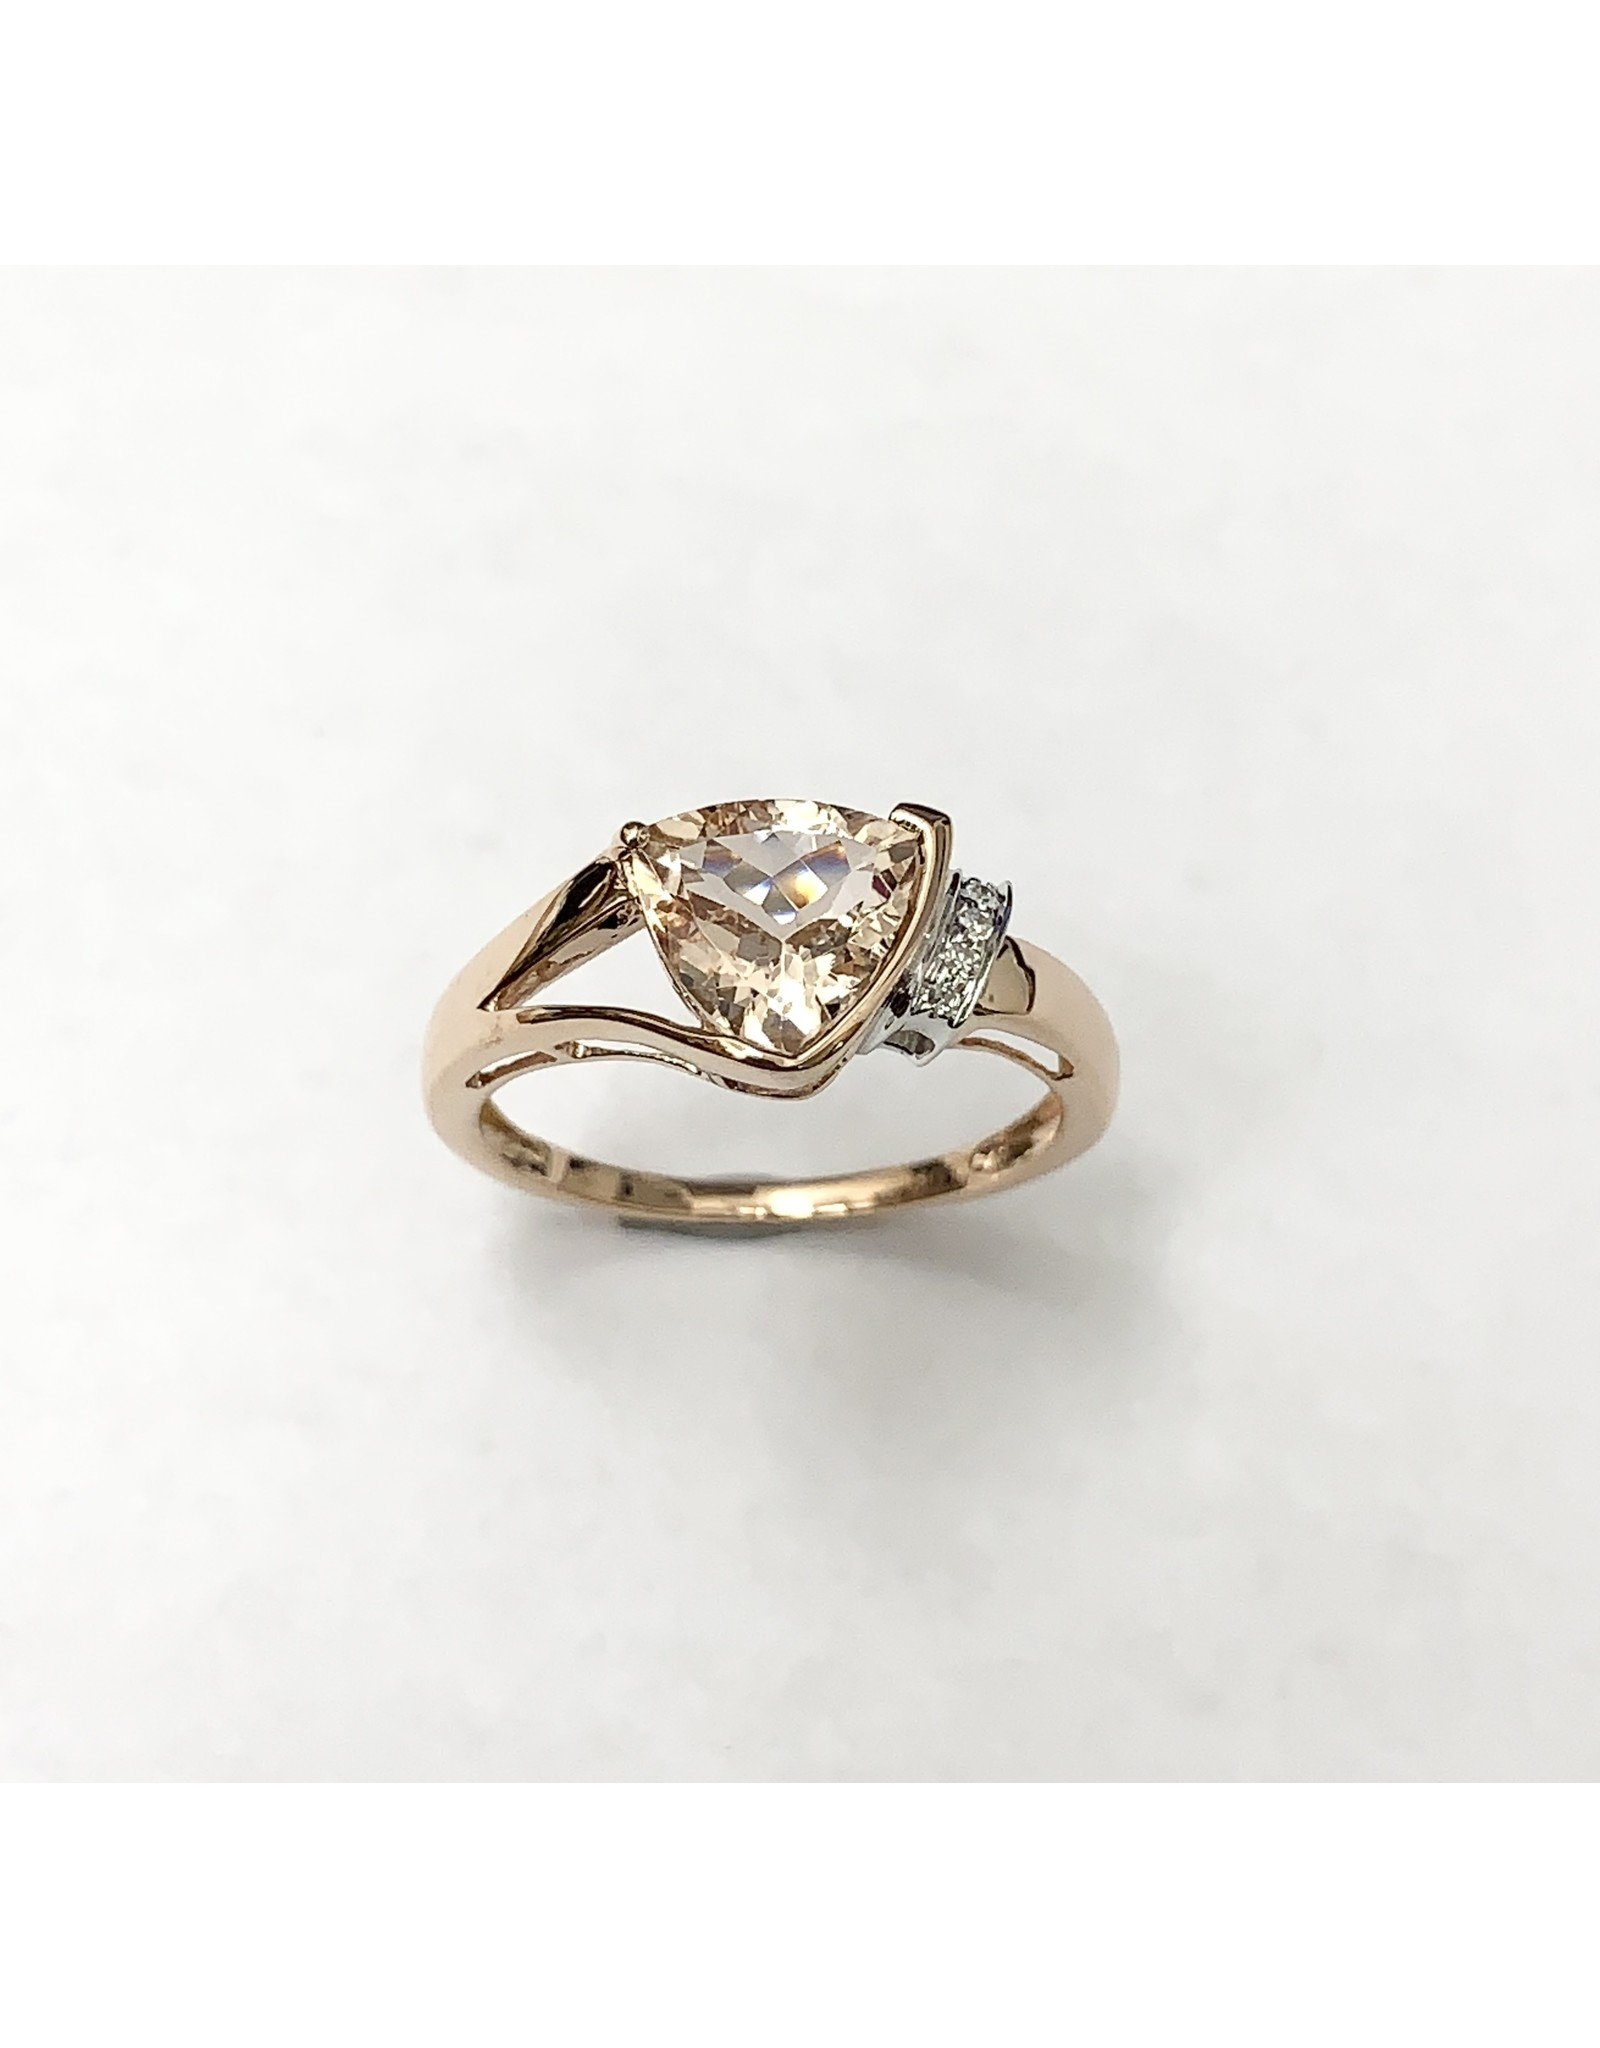 Morganite & Diamond Ring 14KR